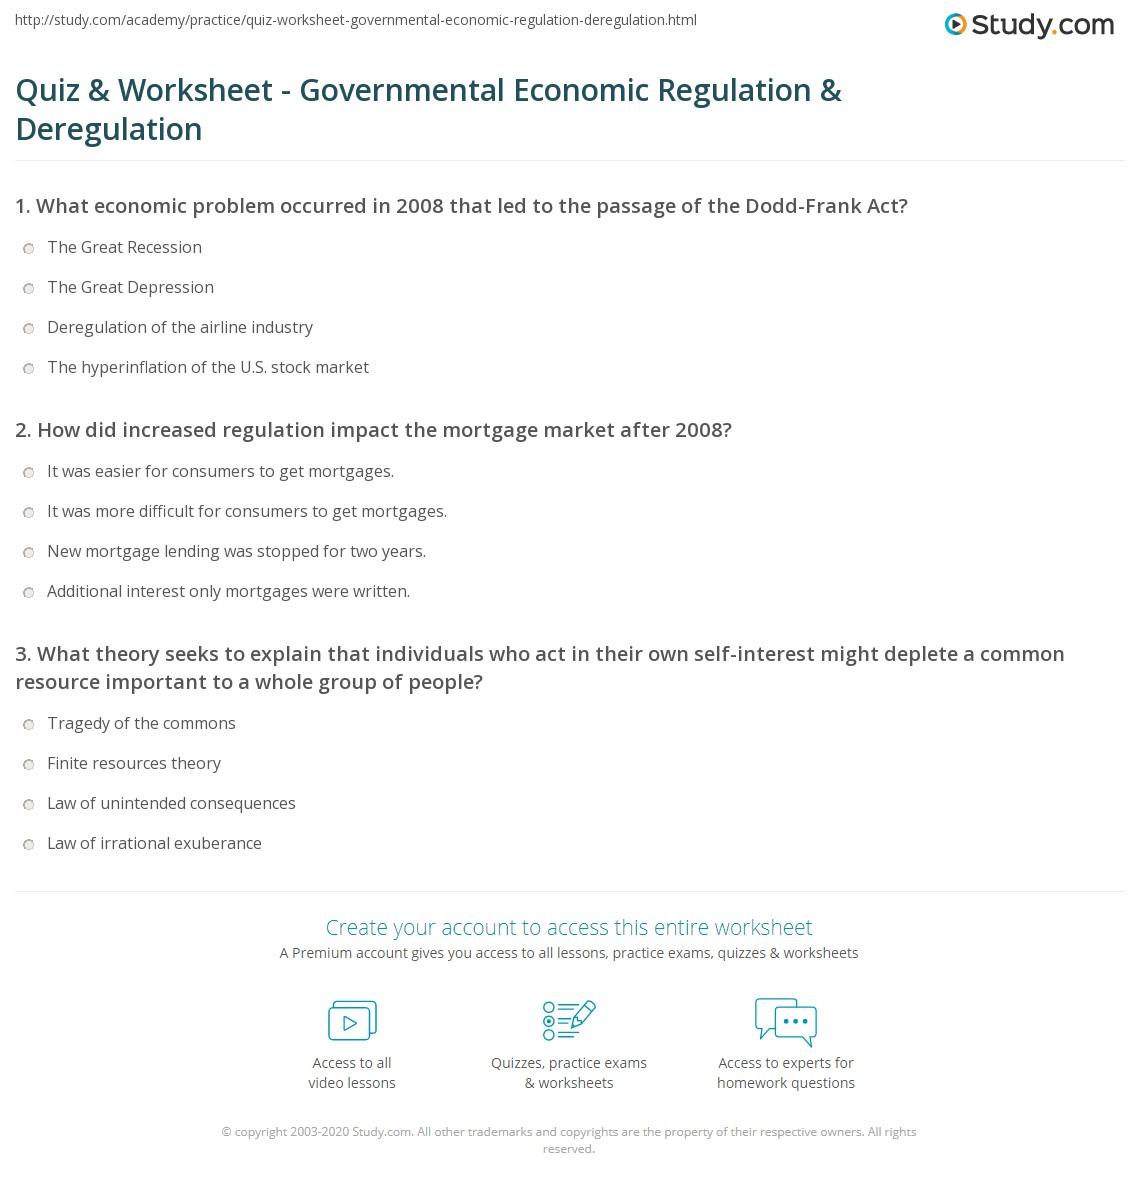 Quiz Worksheet Governmental Economic Regulation Deregulation Study Com